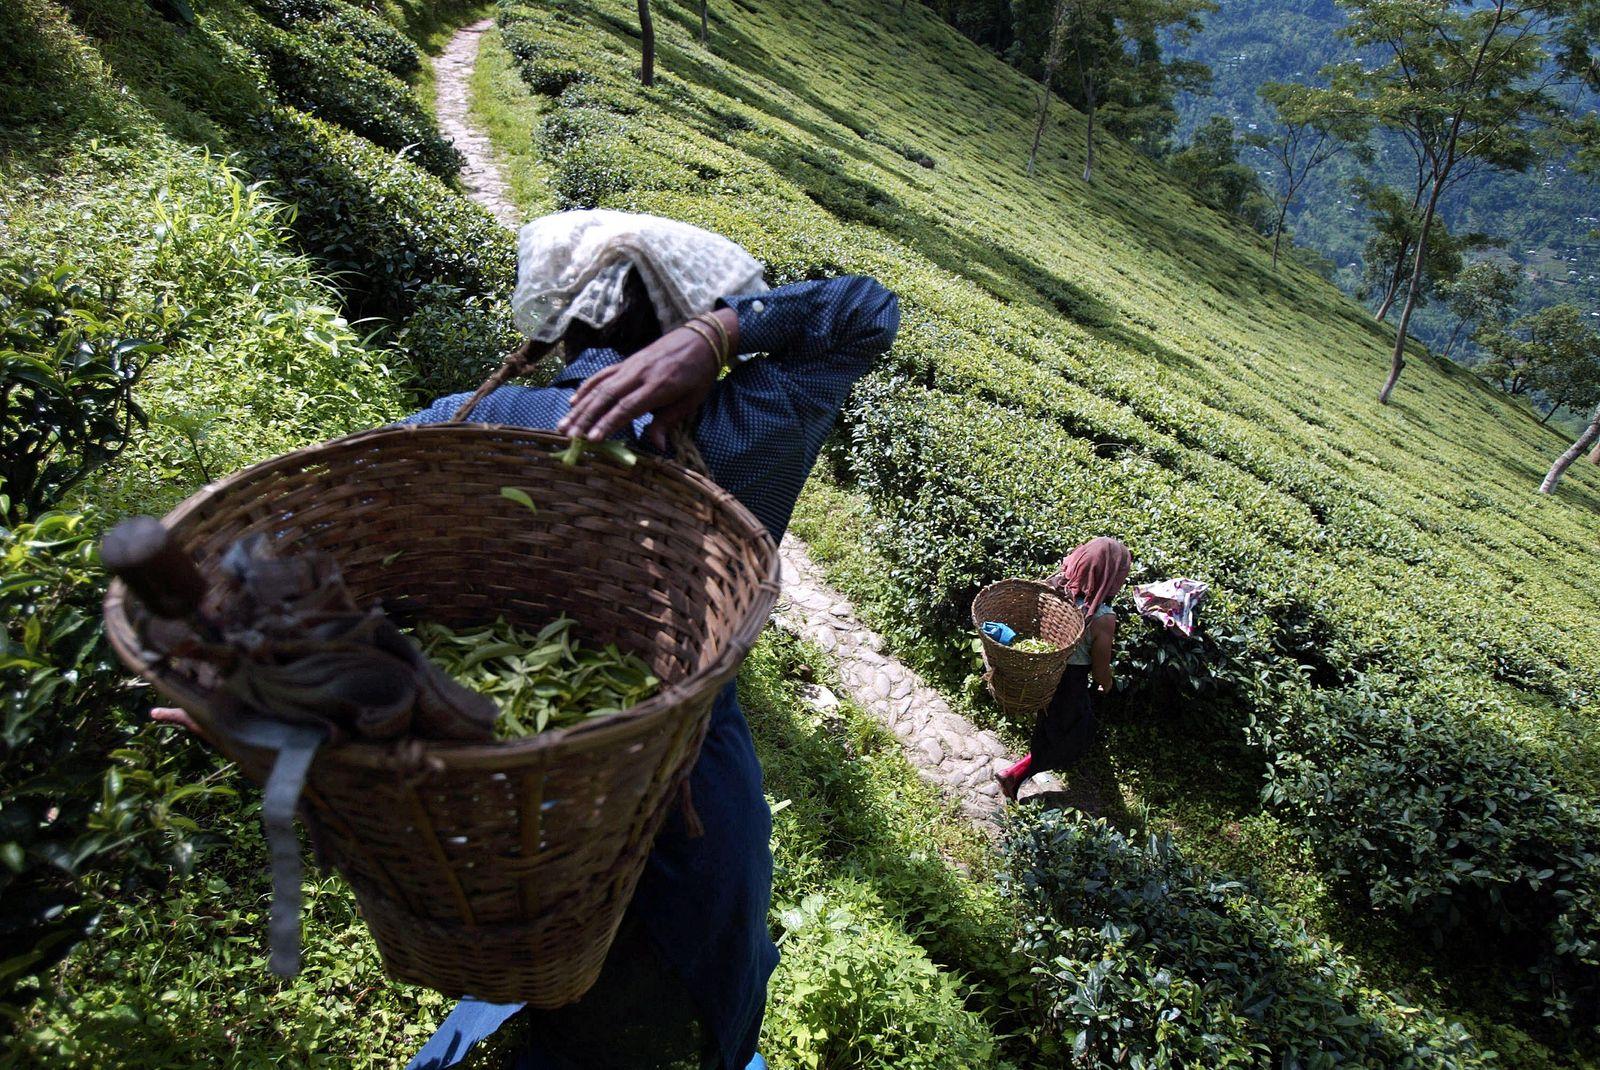 INDIA-COMMODITIES-TEA-TOURISM